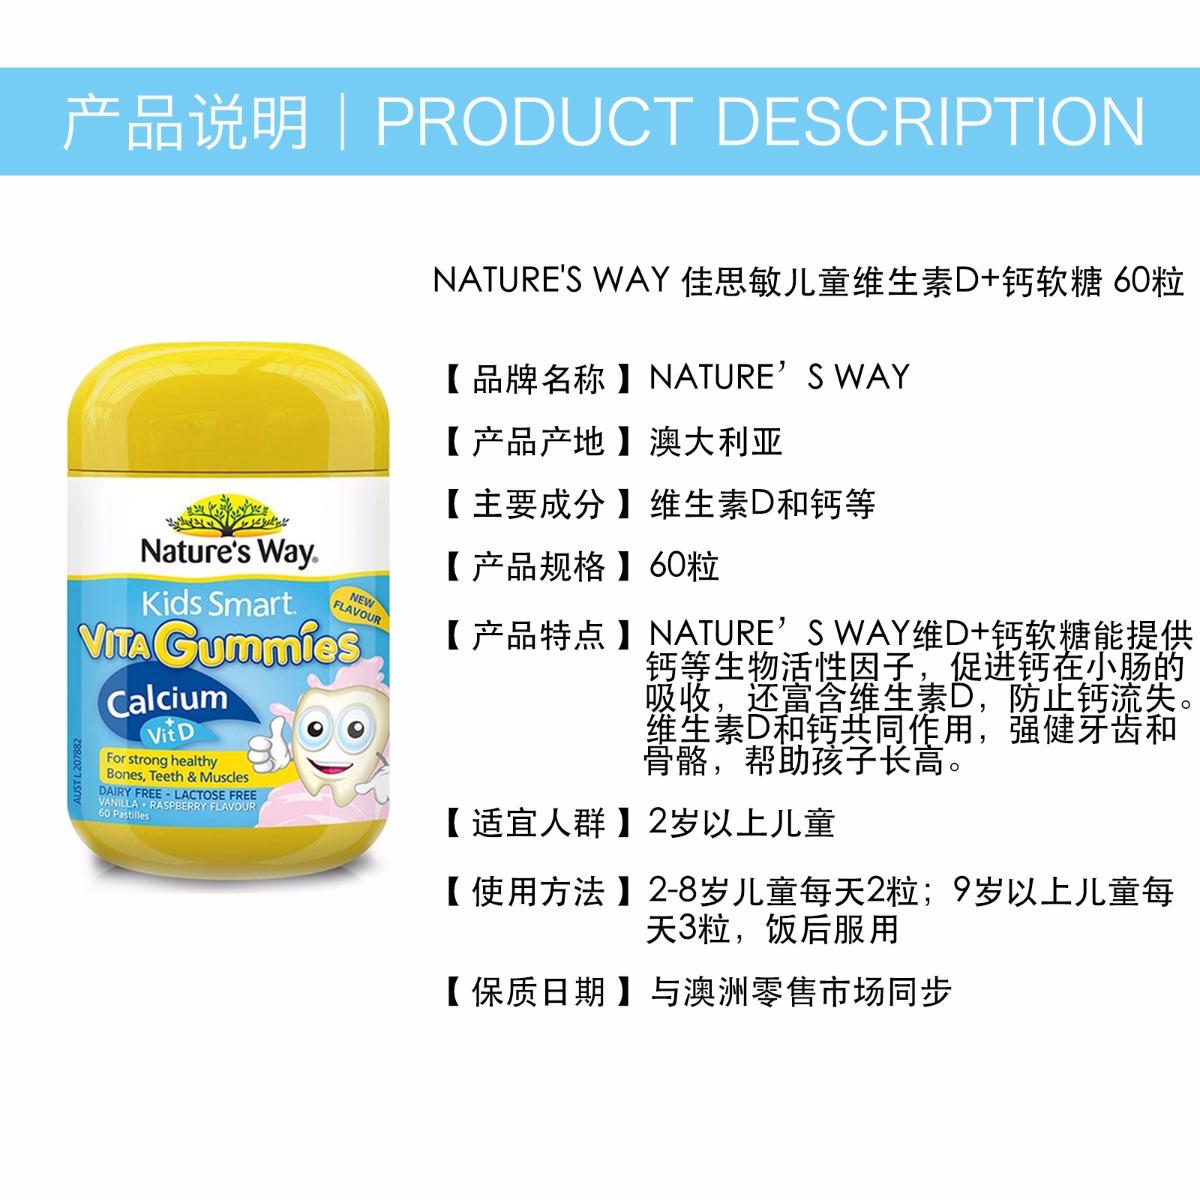 Nature's Way 佳思敏儿童维生素D+钙软糖60粒